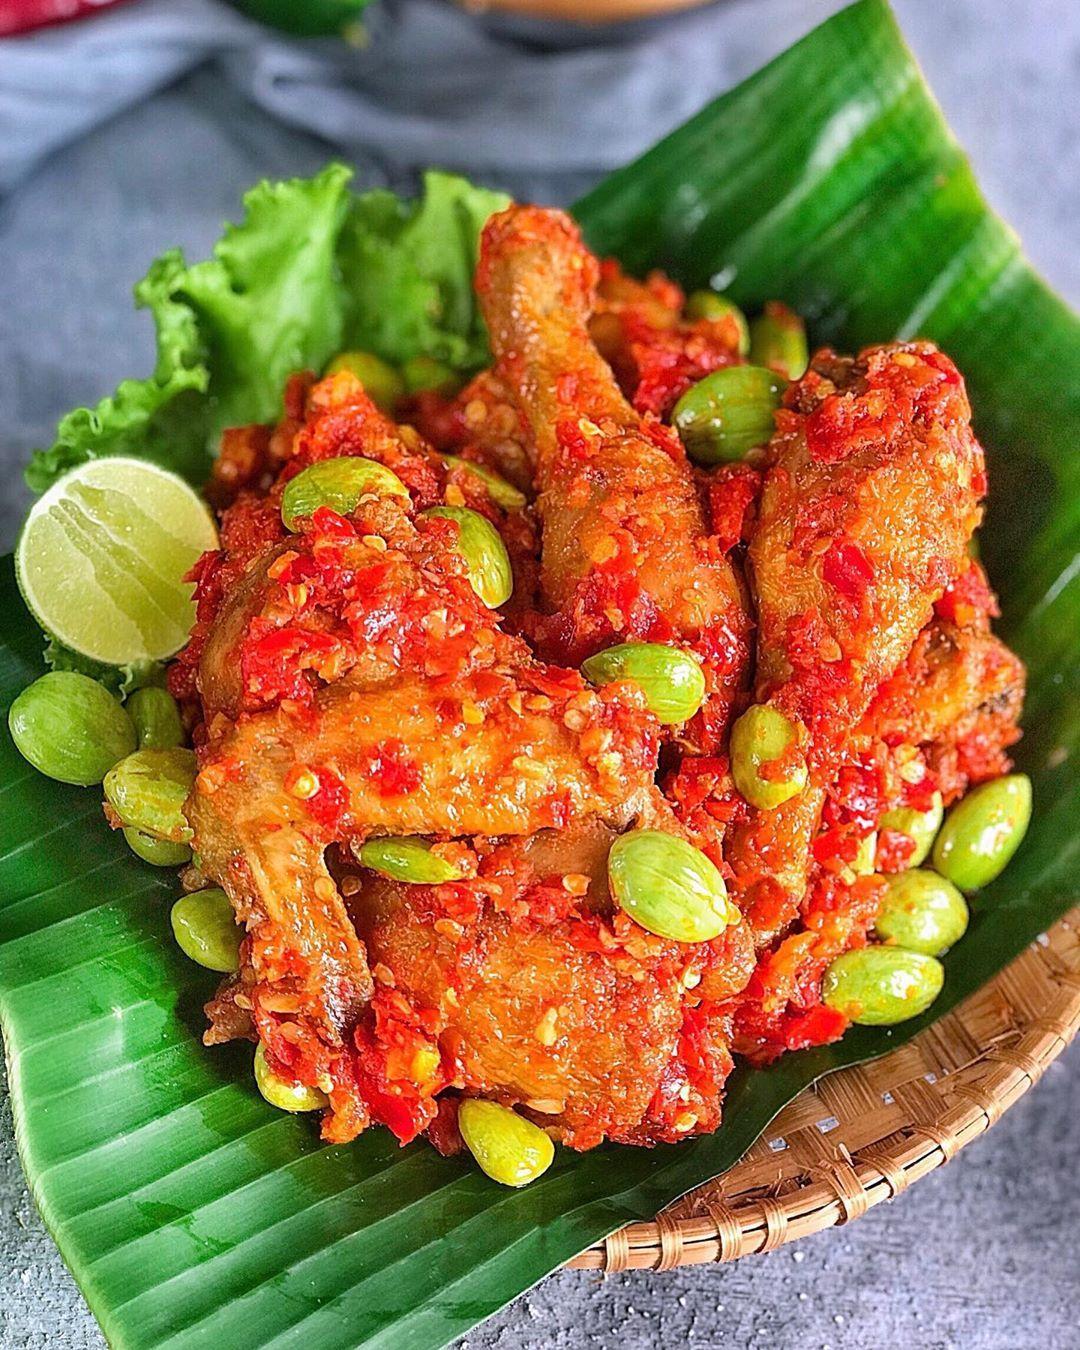 Resep Ayam Goreng Balado Dan Cara Membuat Ayam Goreng Bumbu Balado Lengkap Resep Ayam Goreng Ungkep Dan Bumbu Balado Ayam Pedas Resep Ayam Resep Masakan Resep